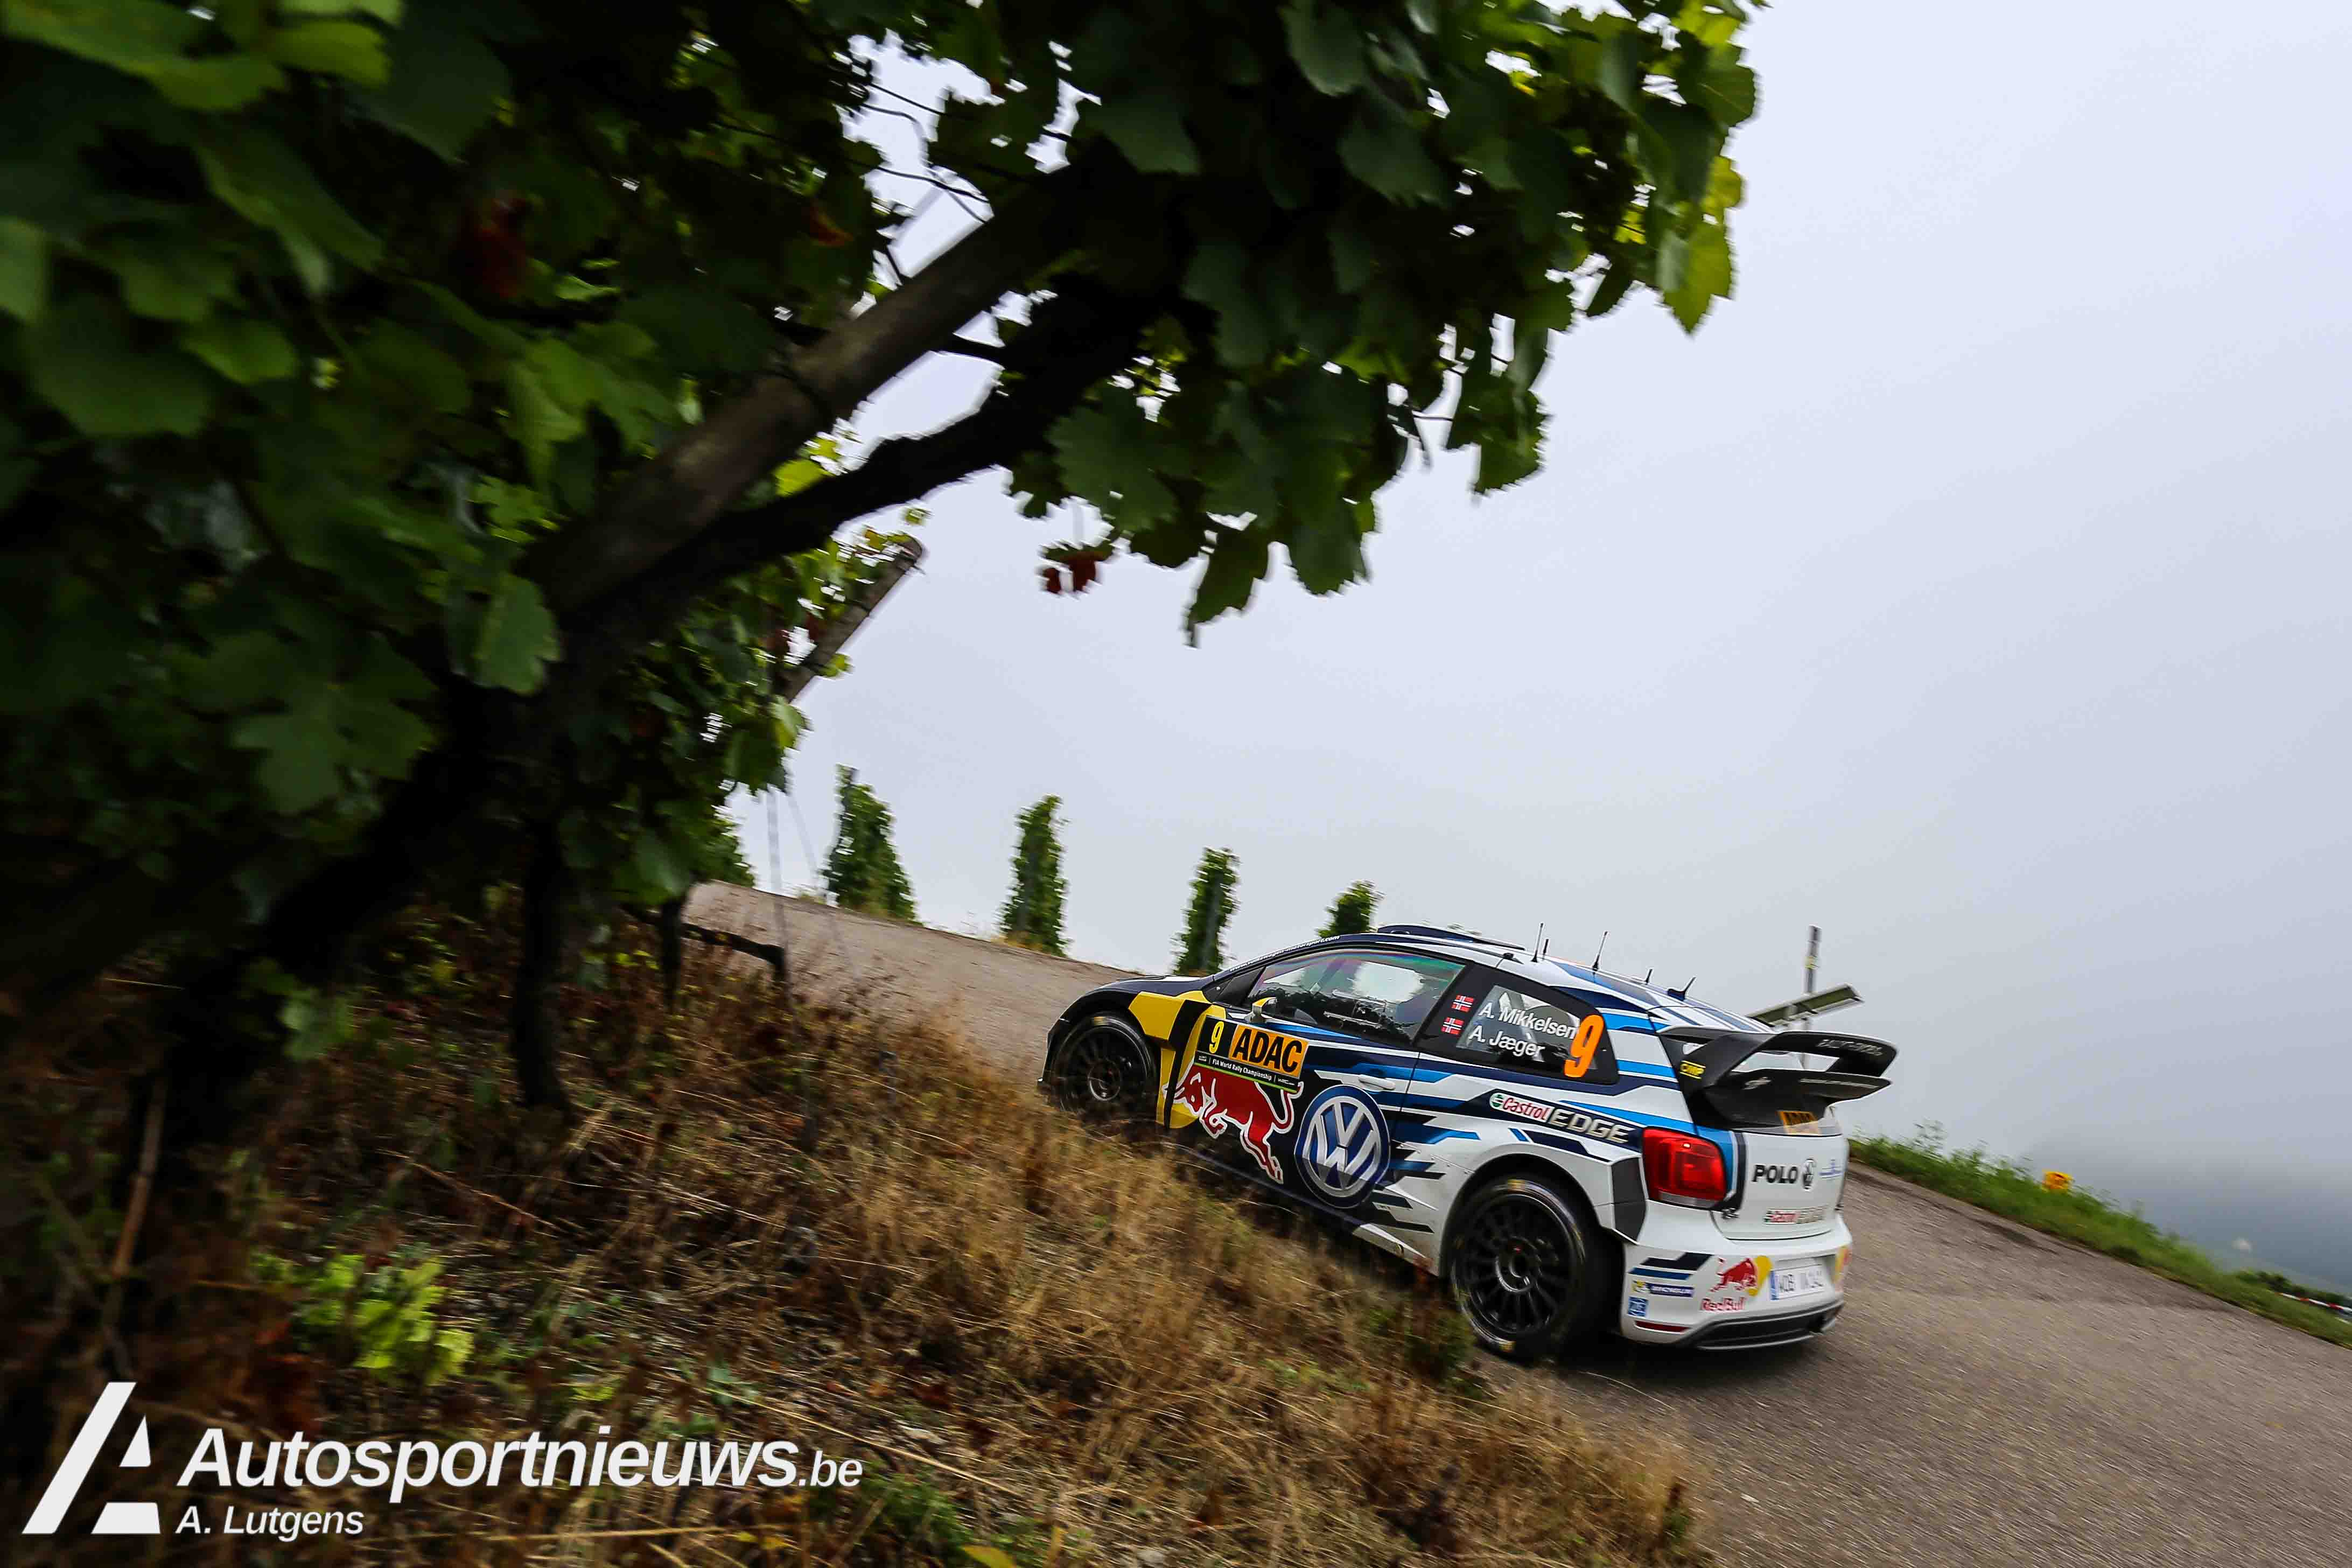 Album: Deutschland Rallye 2016 – A. Lutgens